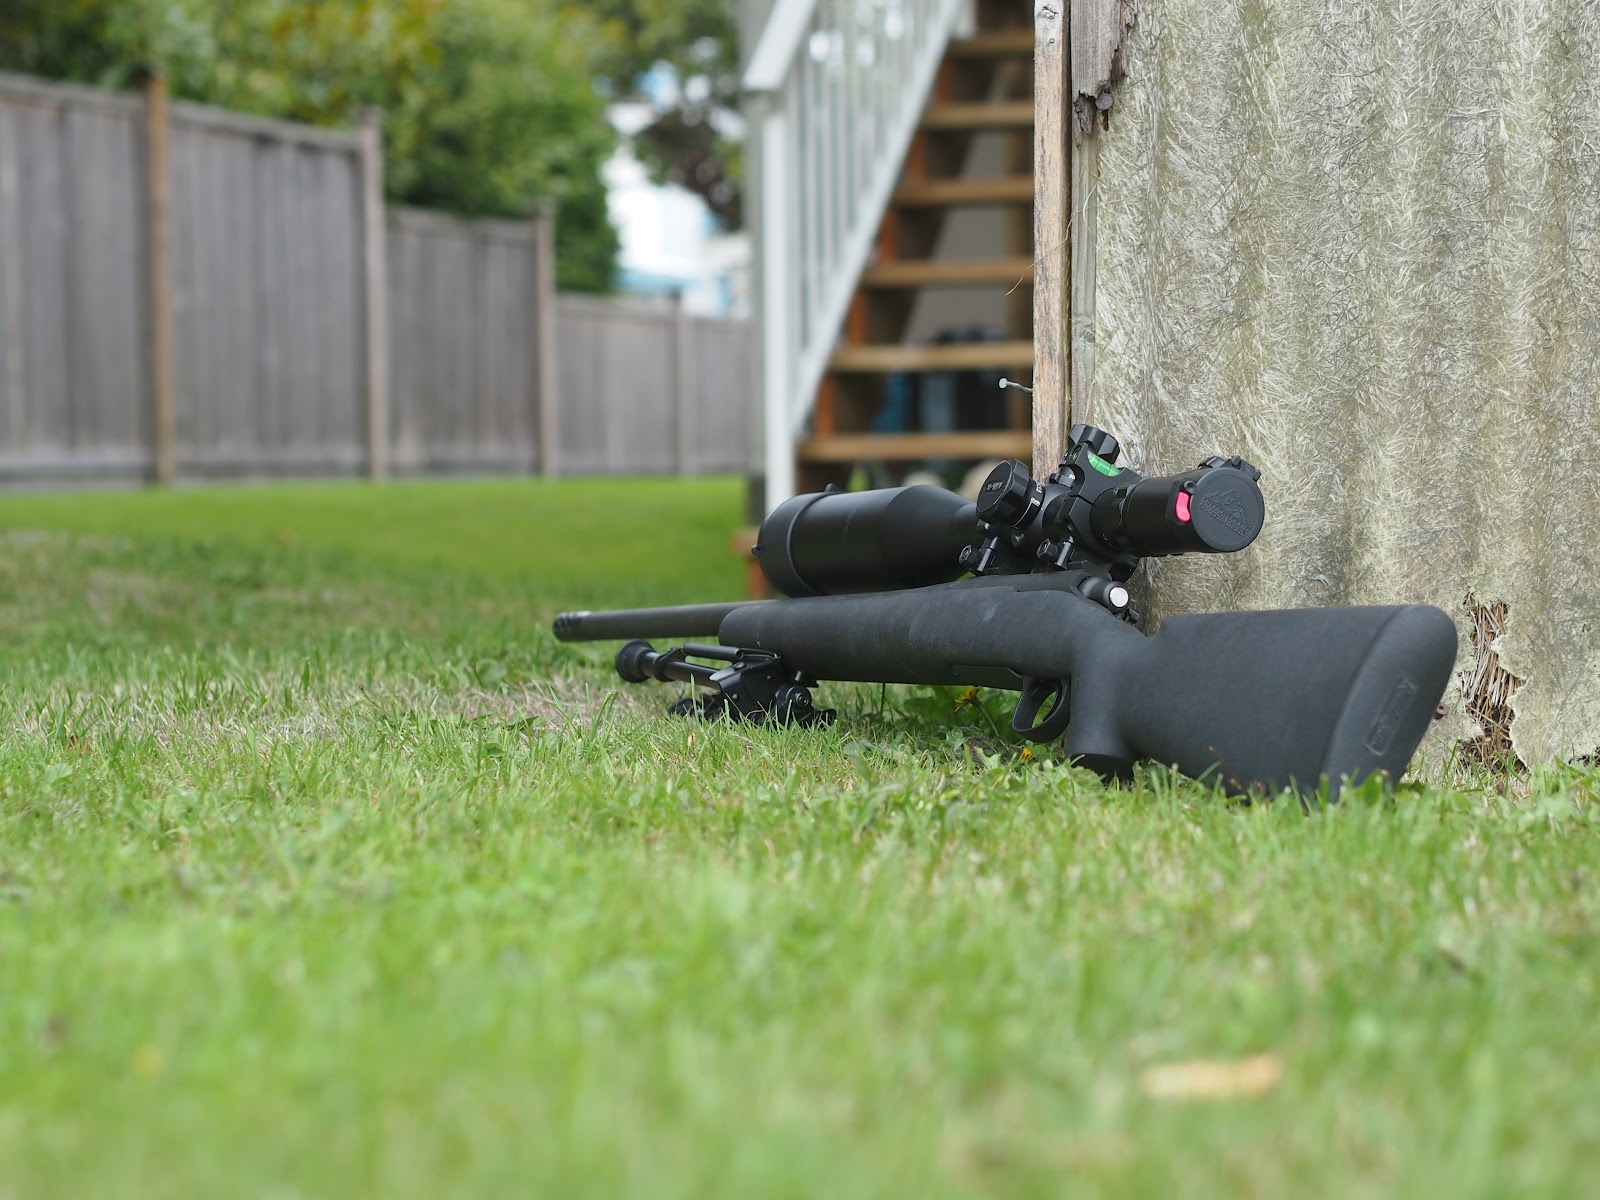 Mister Donut's Firearms Blog: Remington 700 Police aka 700p